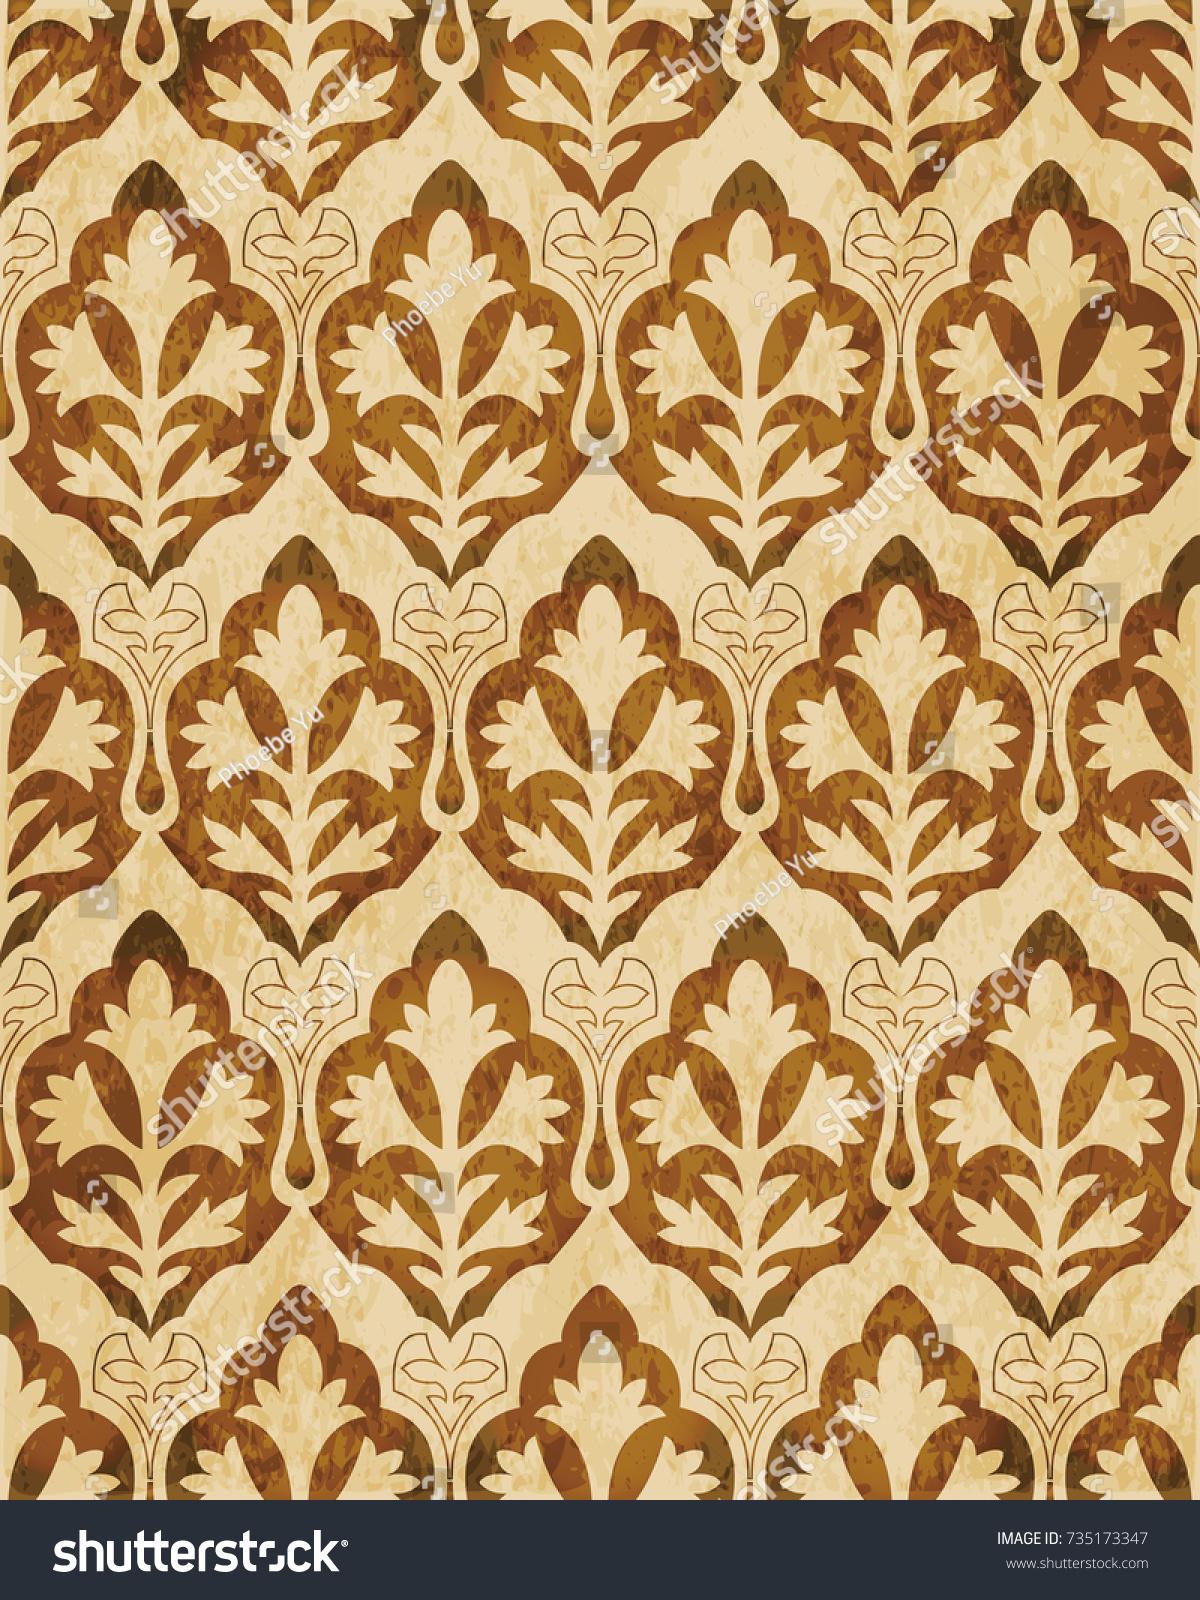 Retro Brown Watercolor Texture Grunge Seamless Stock Vector ...